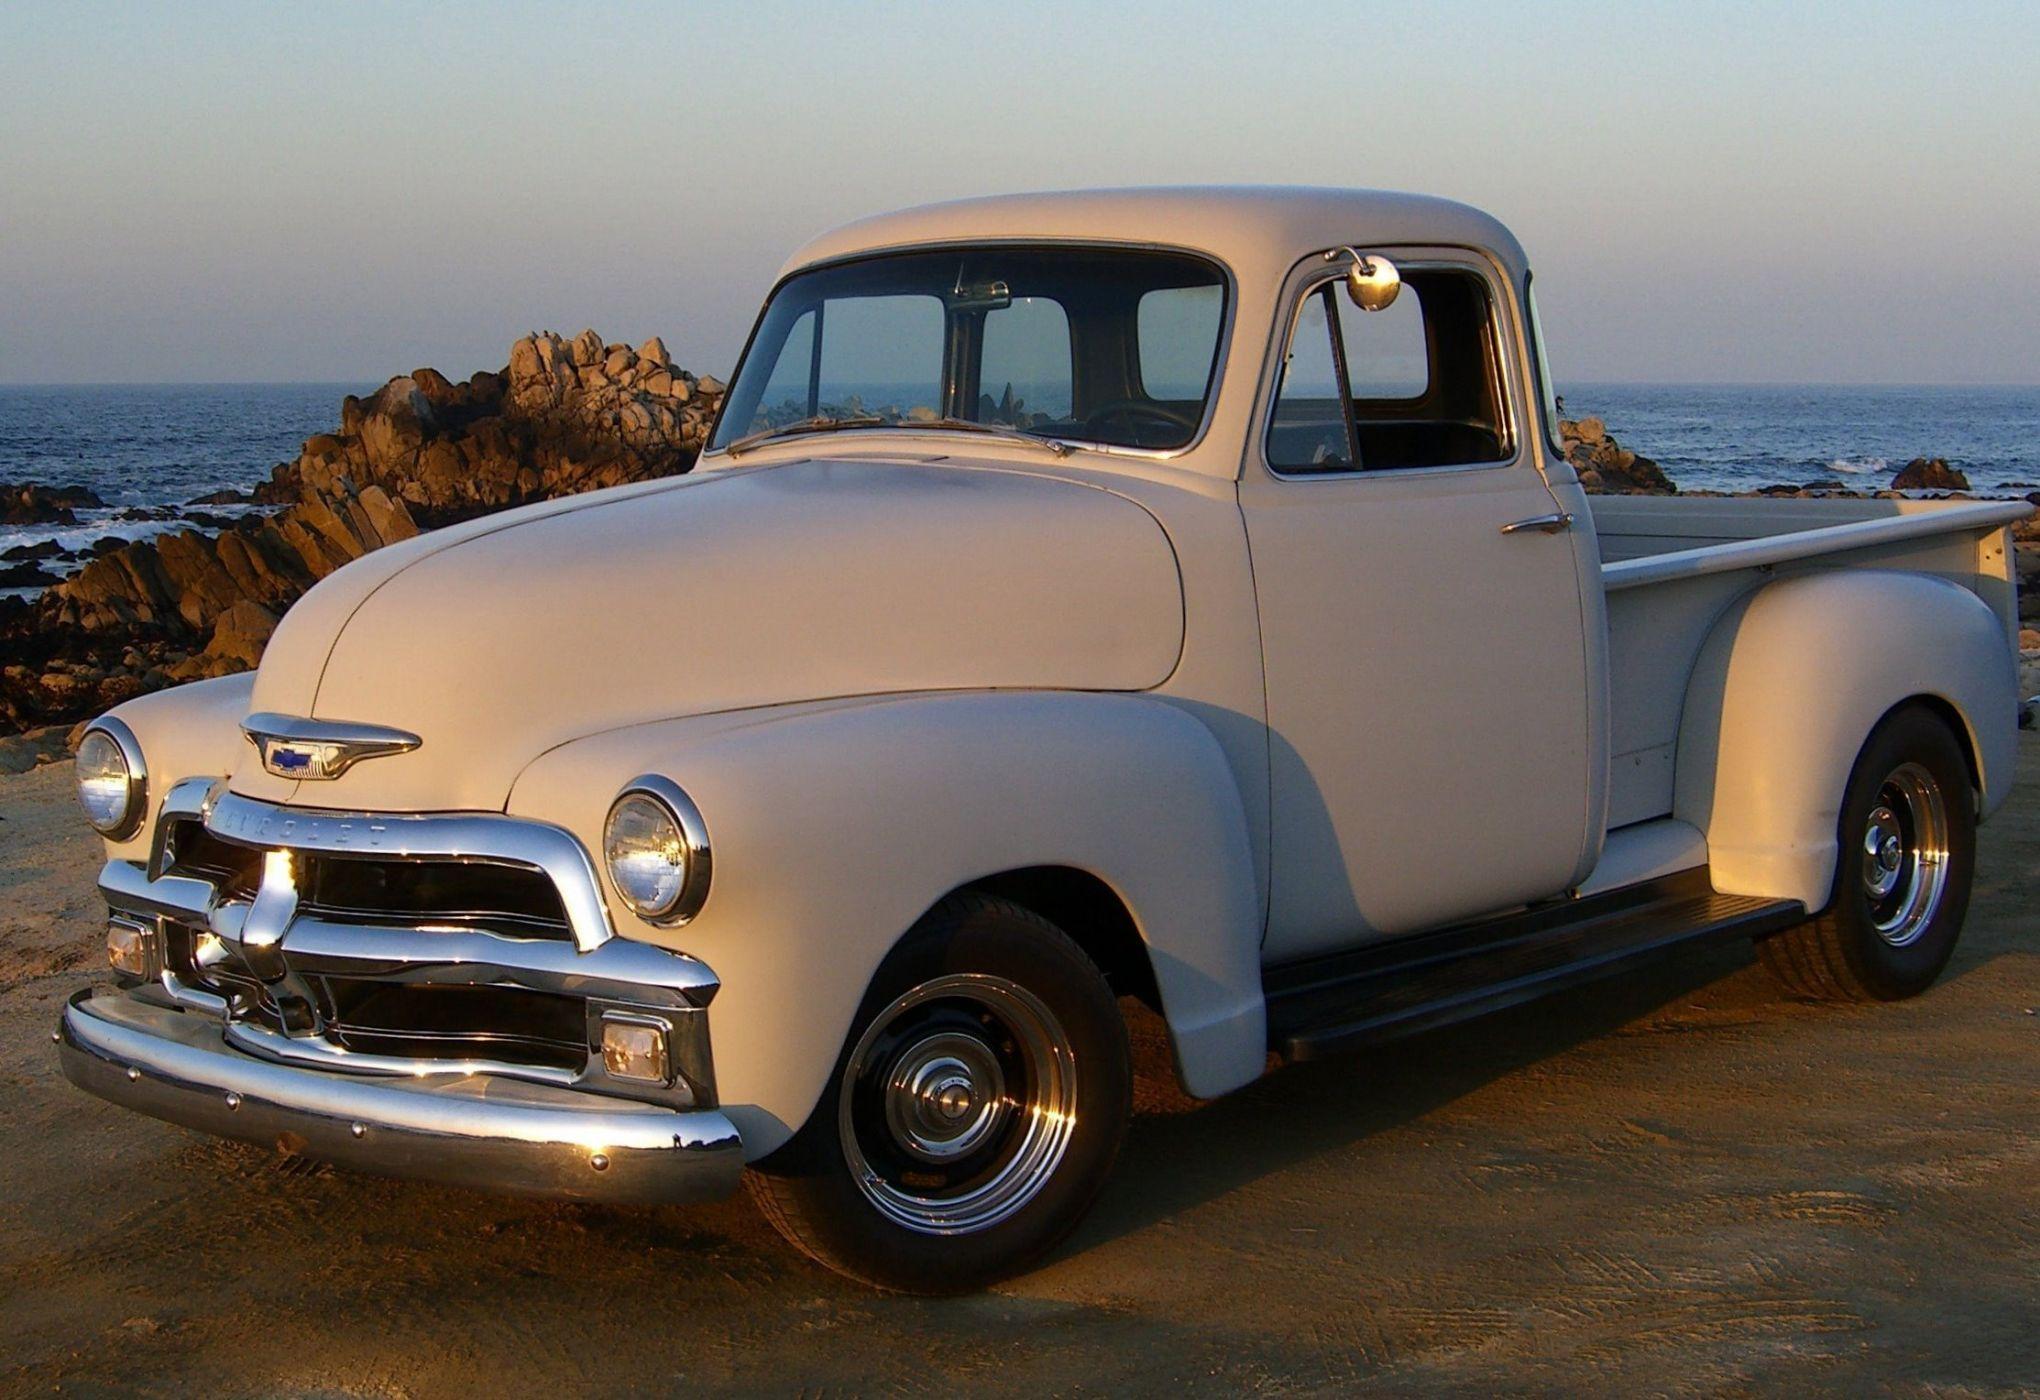 1954 Chevrolet 3100 Pickup Retro Wallpaper Chevrolet Trucks Classic Chevy Trucks Chevy Trucks